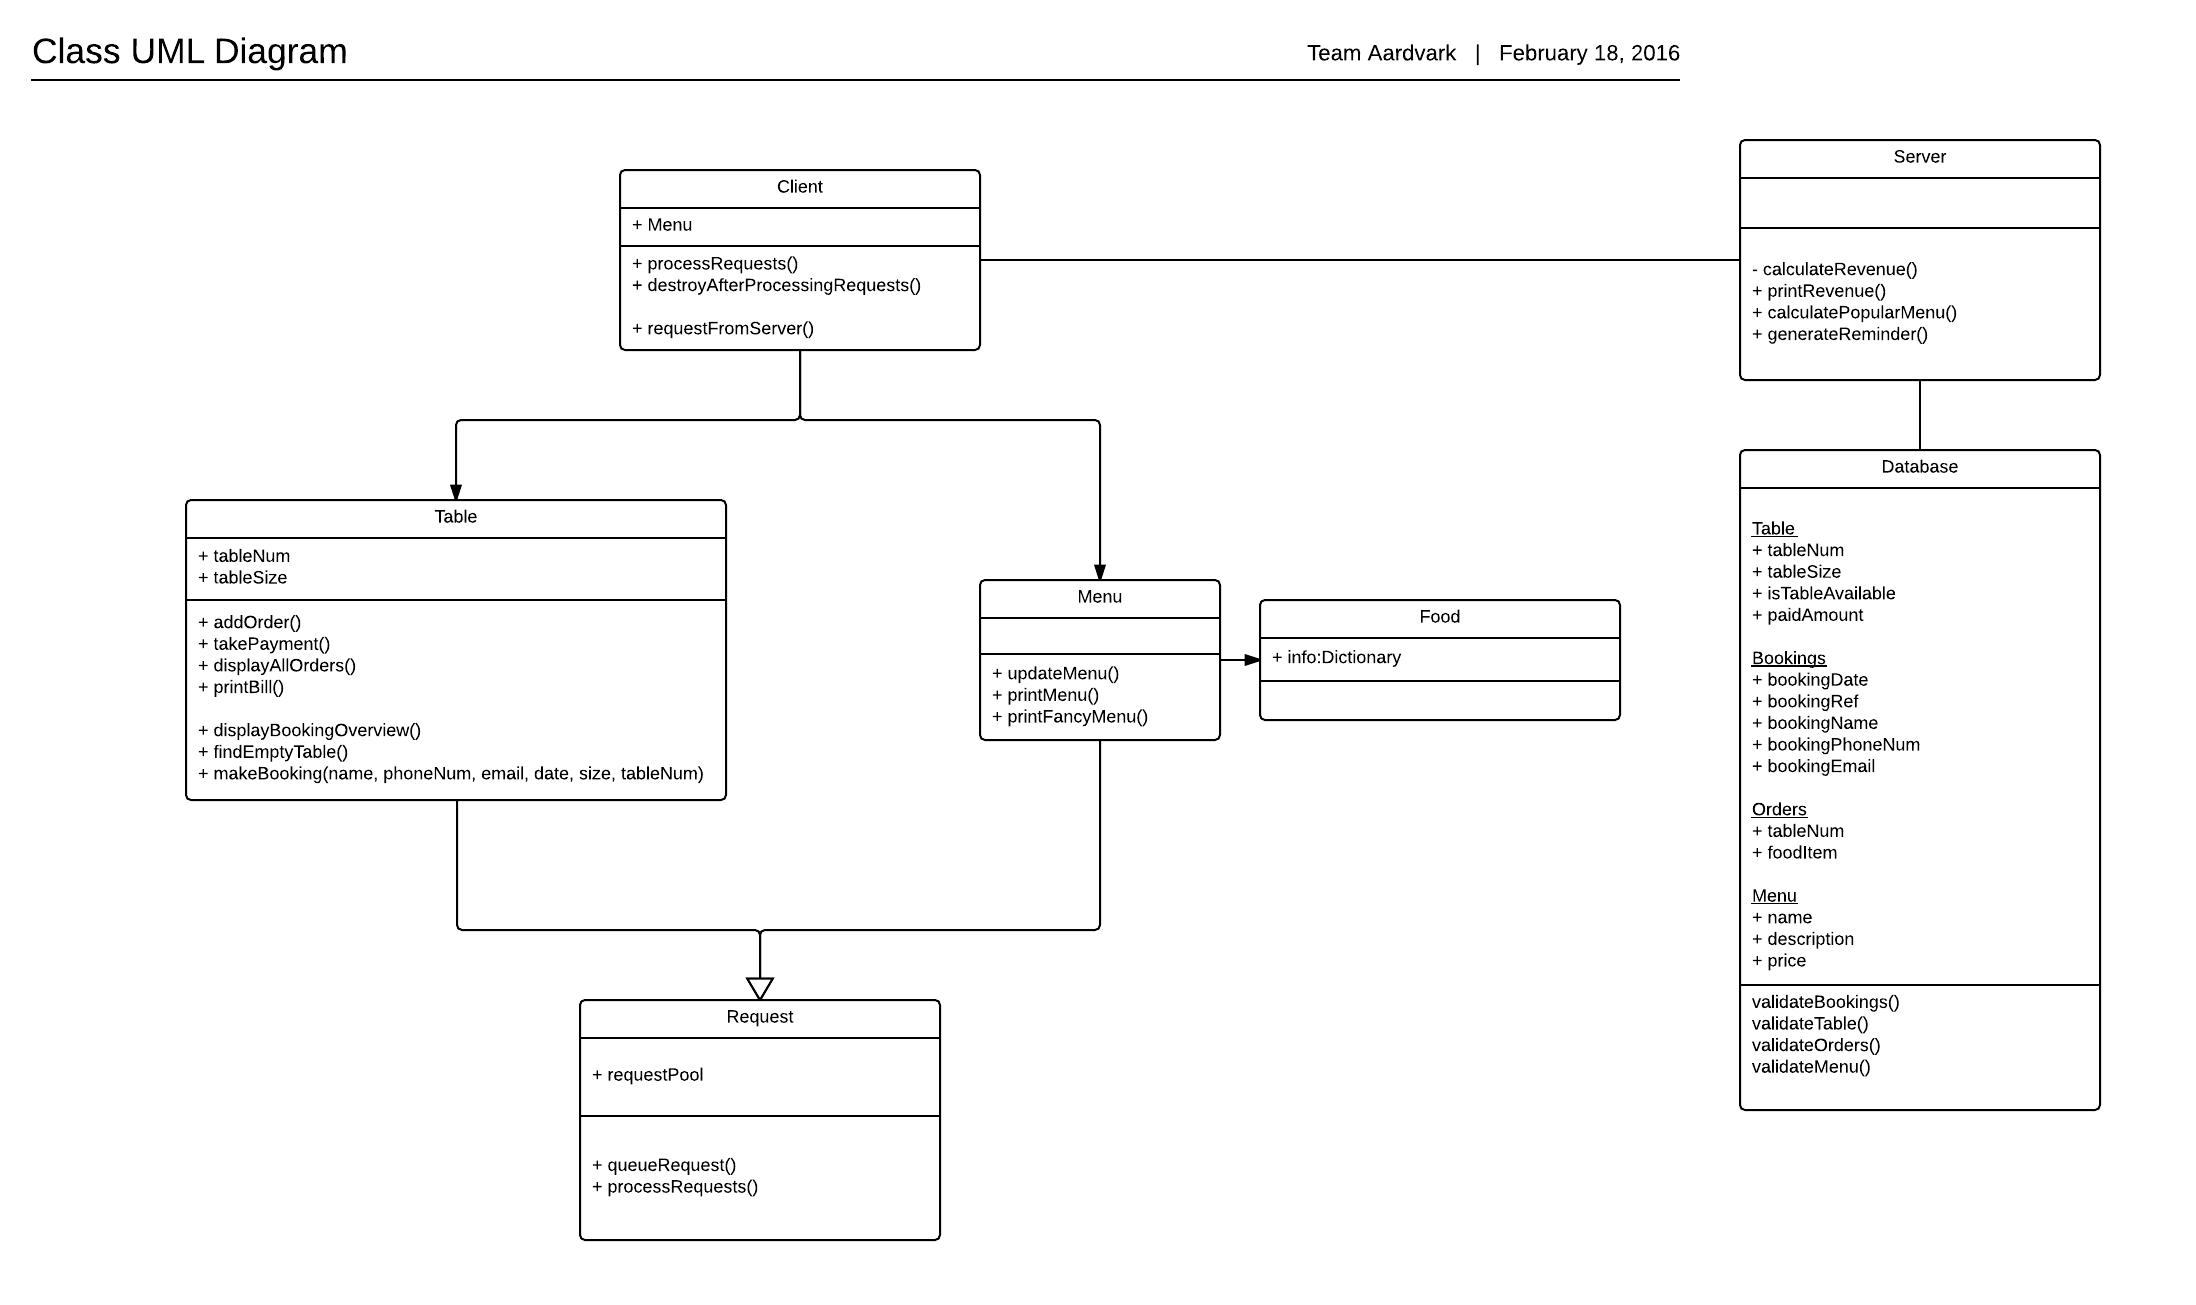 application server diagram 92 honda accord engine improving the design of a simple restaurant client